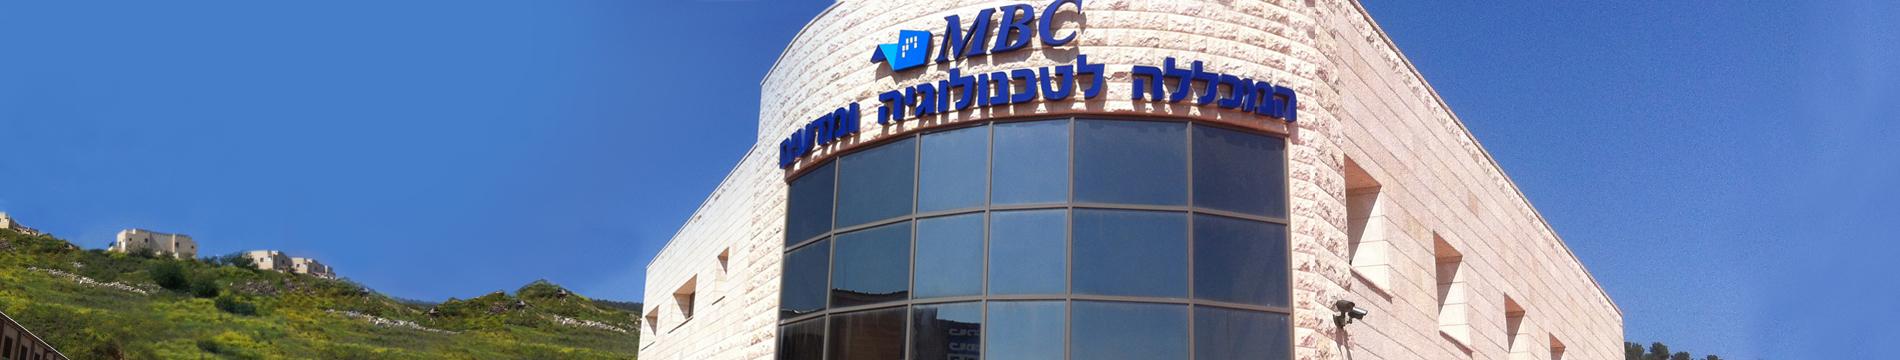 1900x360-מכללת-MBC